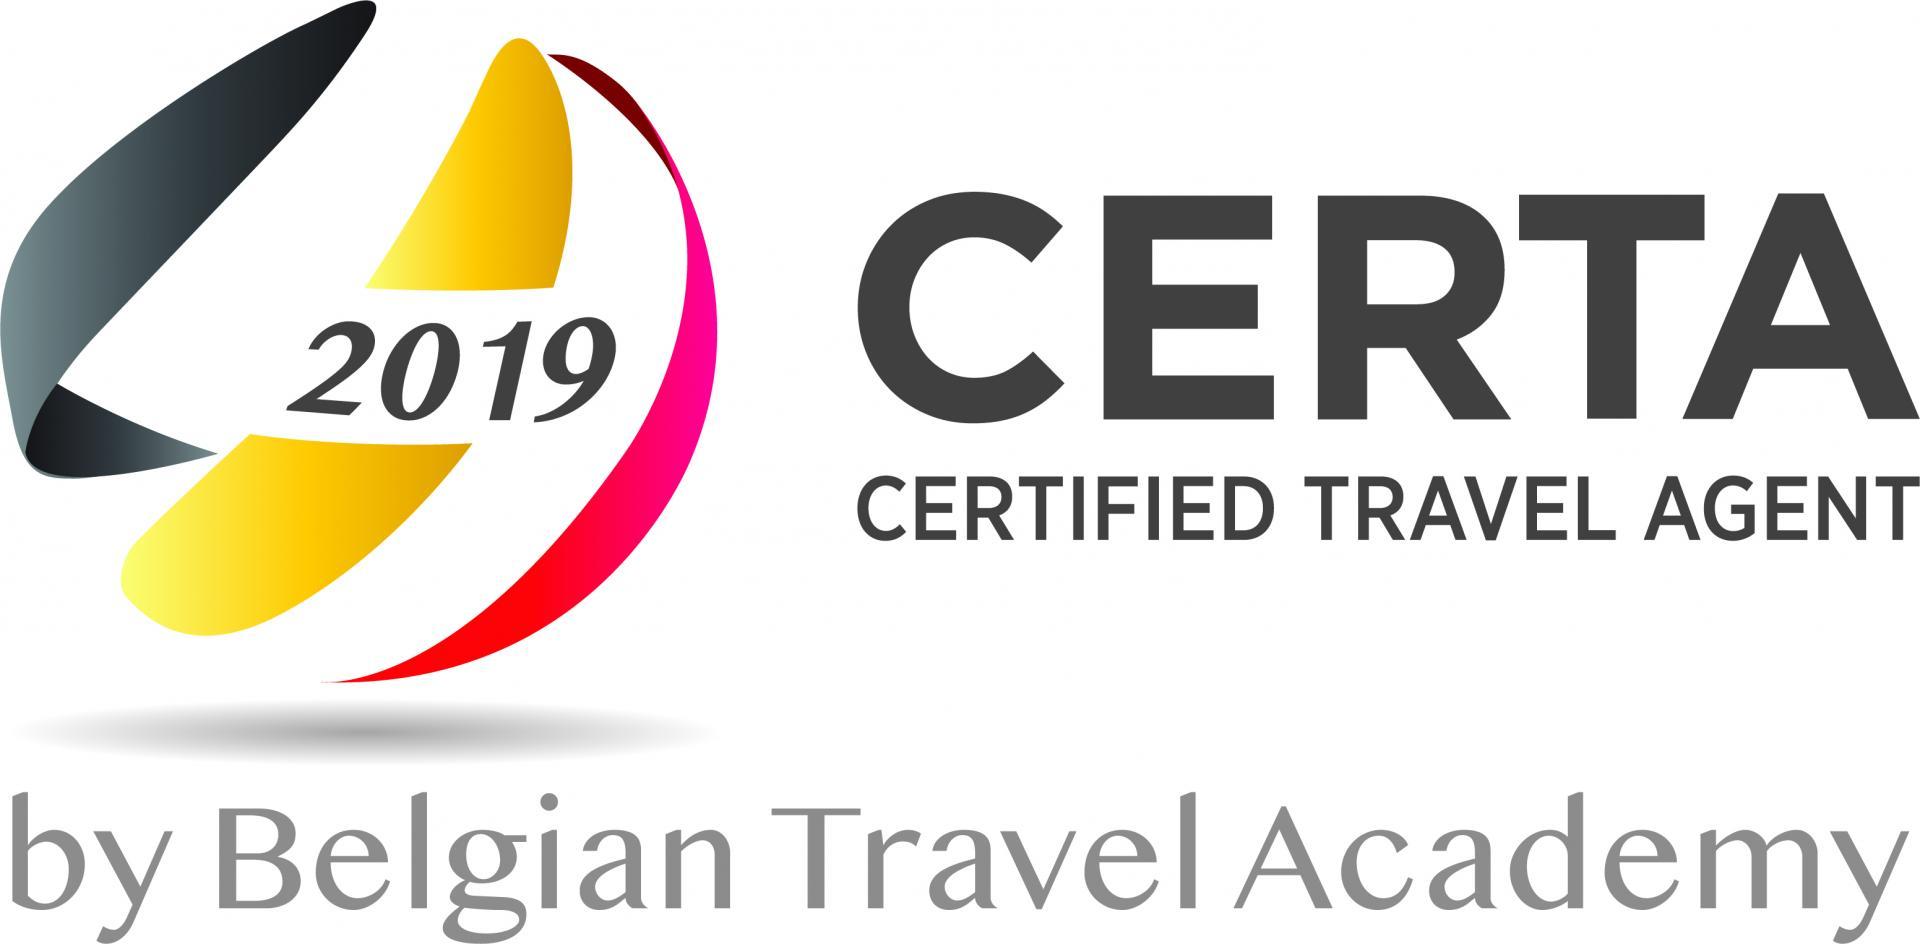 Logo certa 2019